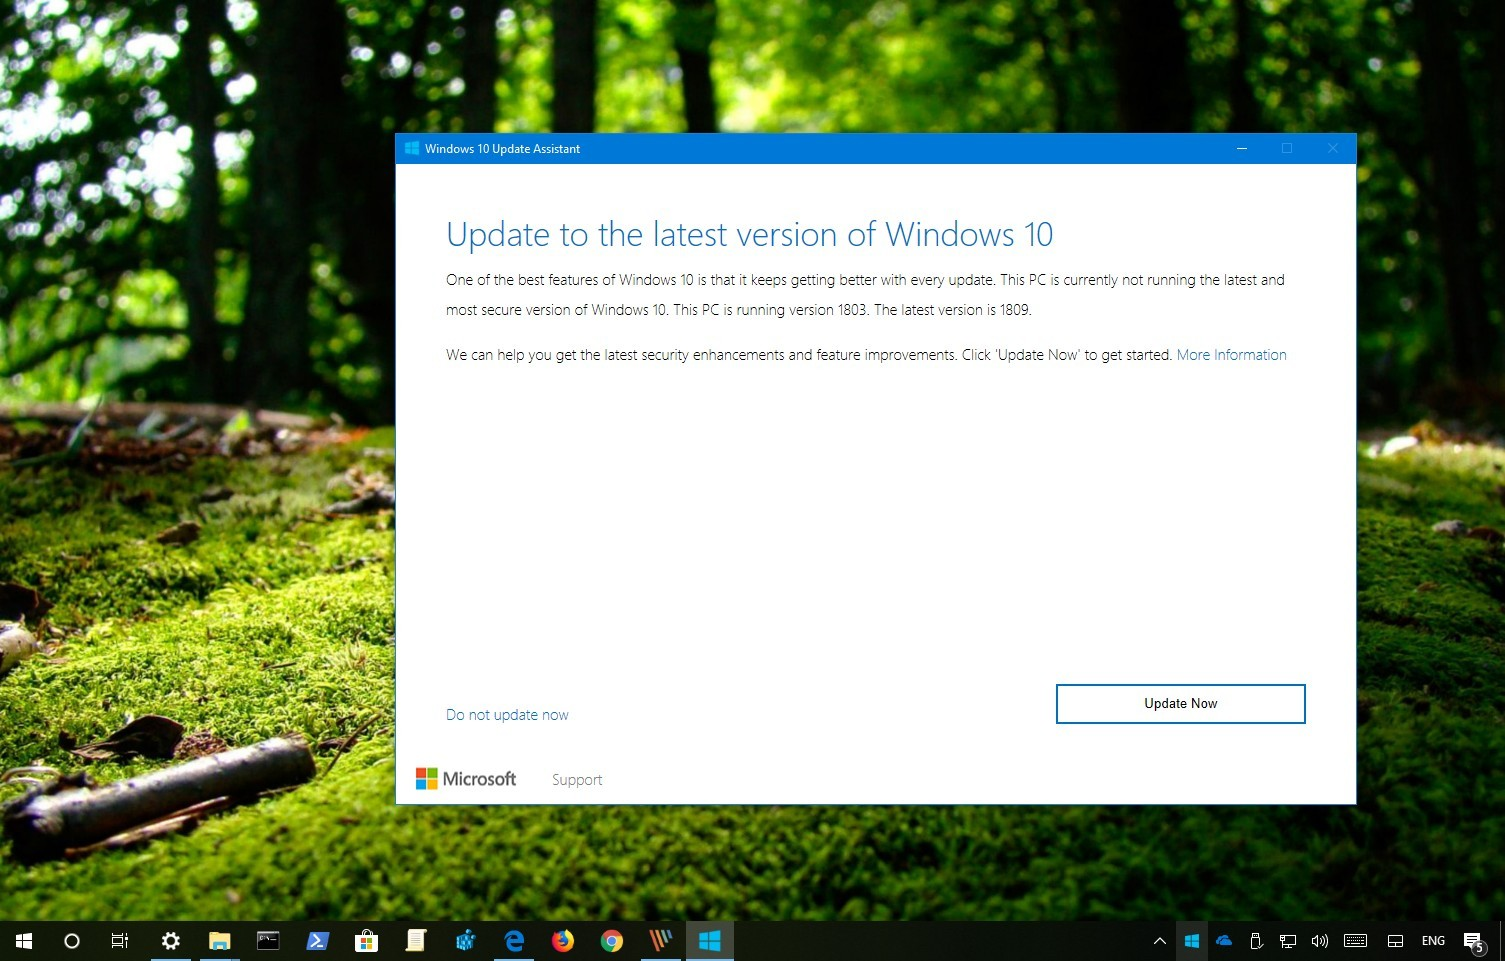 Windows 10 version 1809 download using Update Assistant